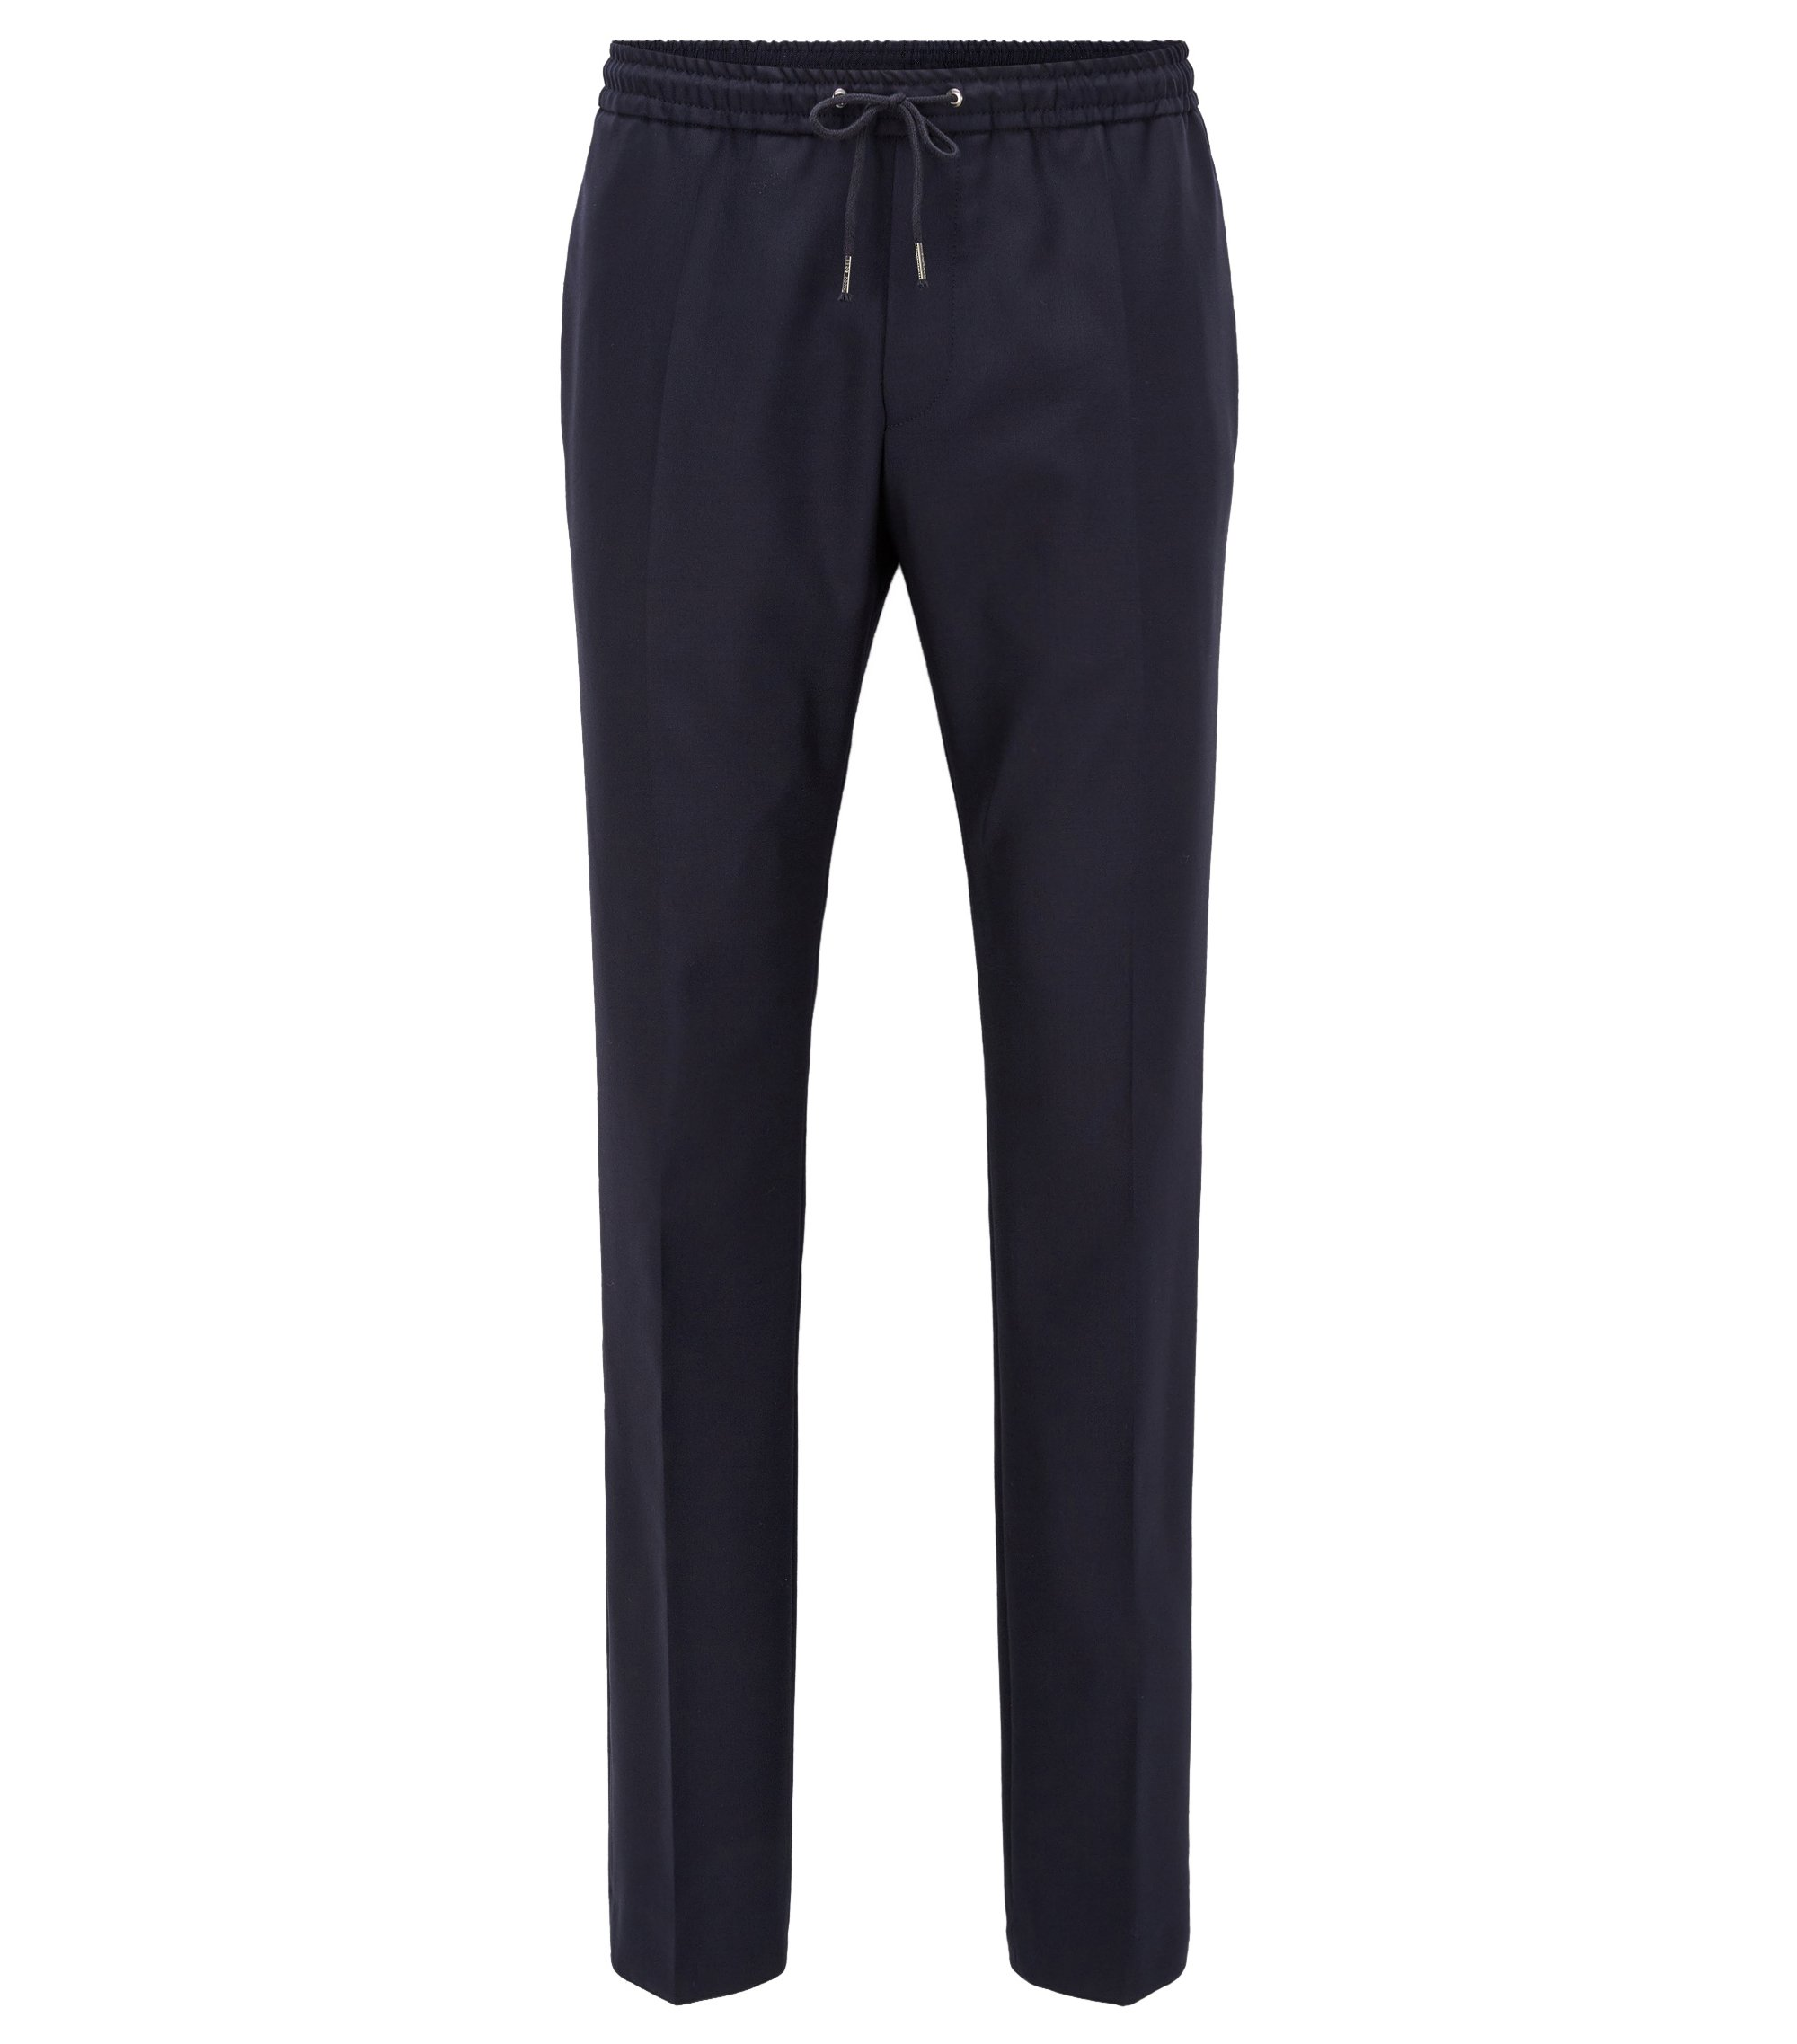 Pantaloni con cordoncino relaxed fit in lana vergine, Blu scuro